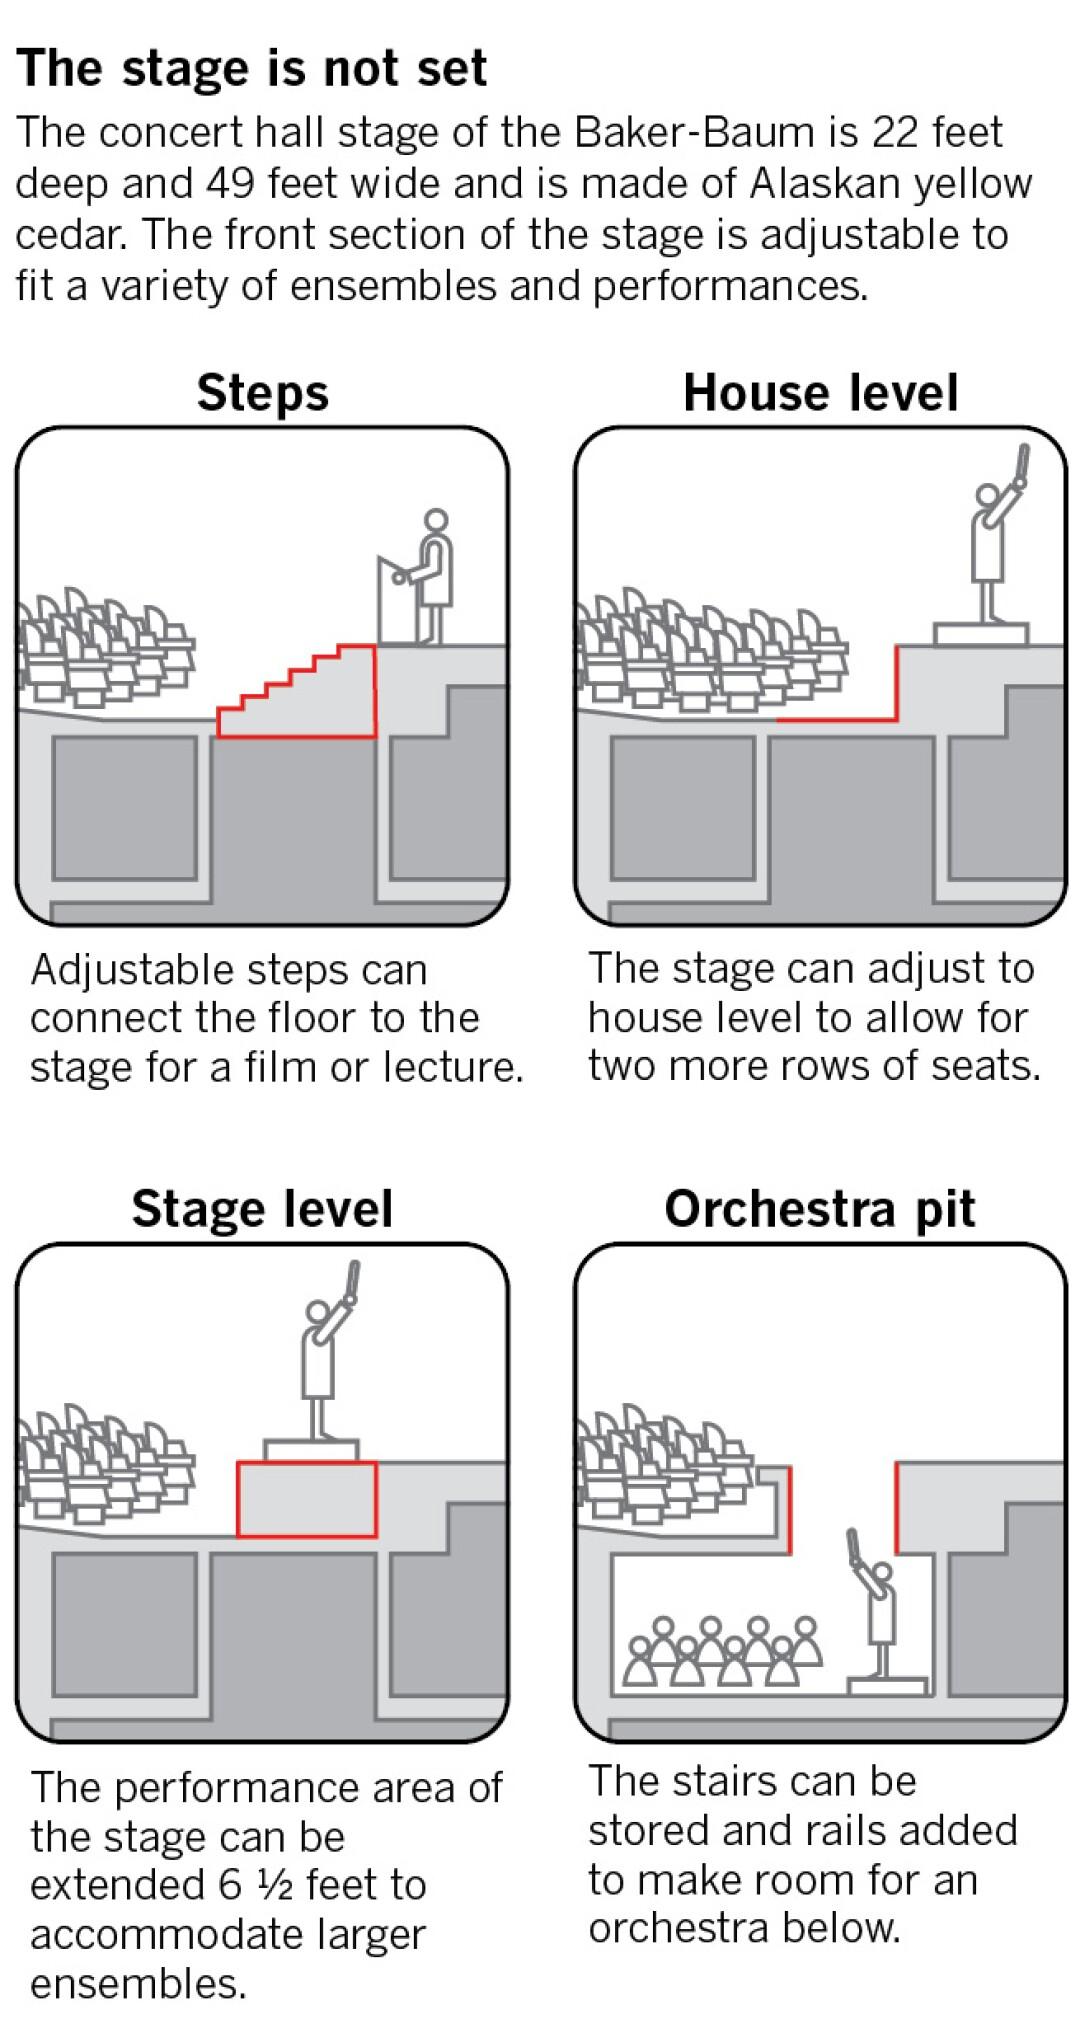 sd-me-g-the-conrad-WEB_Stage.jpg